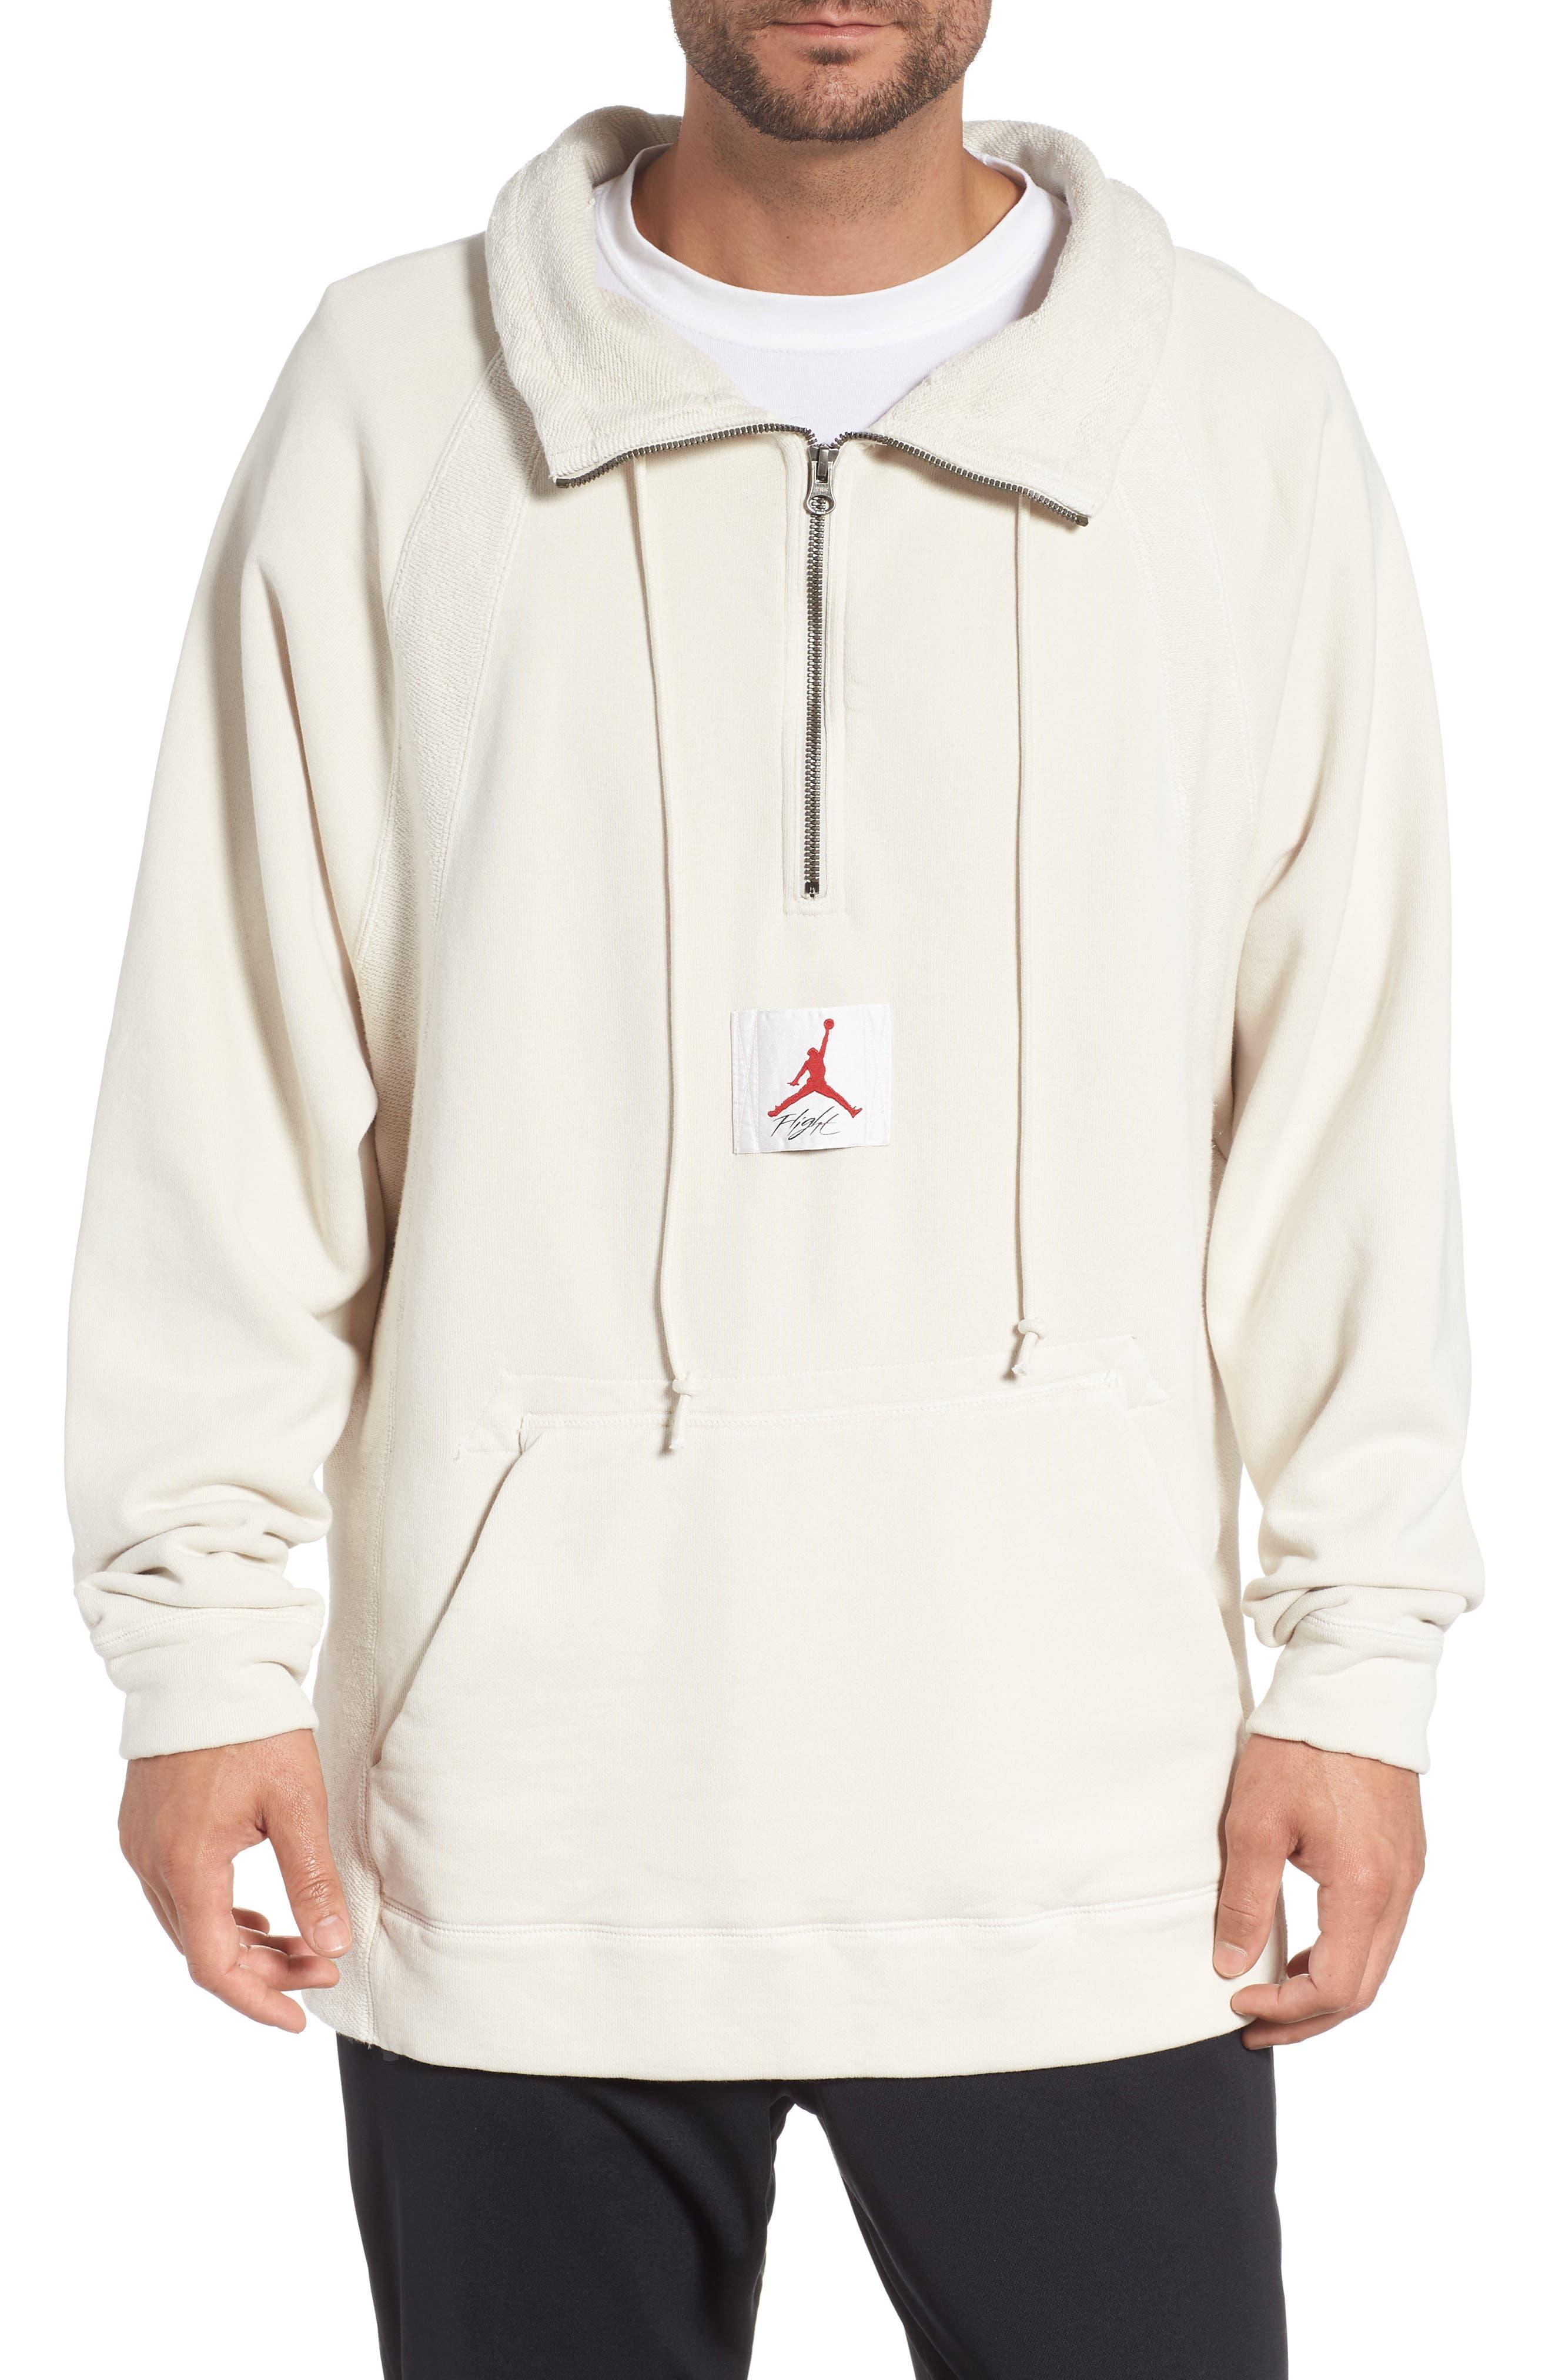 Jordan Wings Washed Quarter Zip Sweatshirt